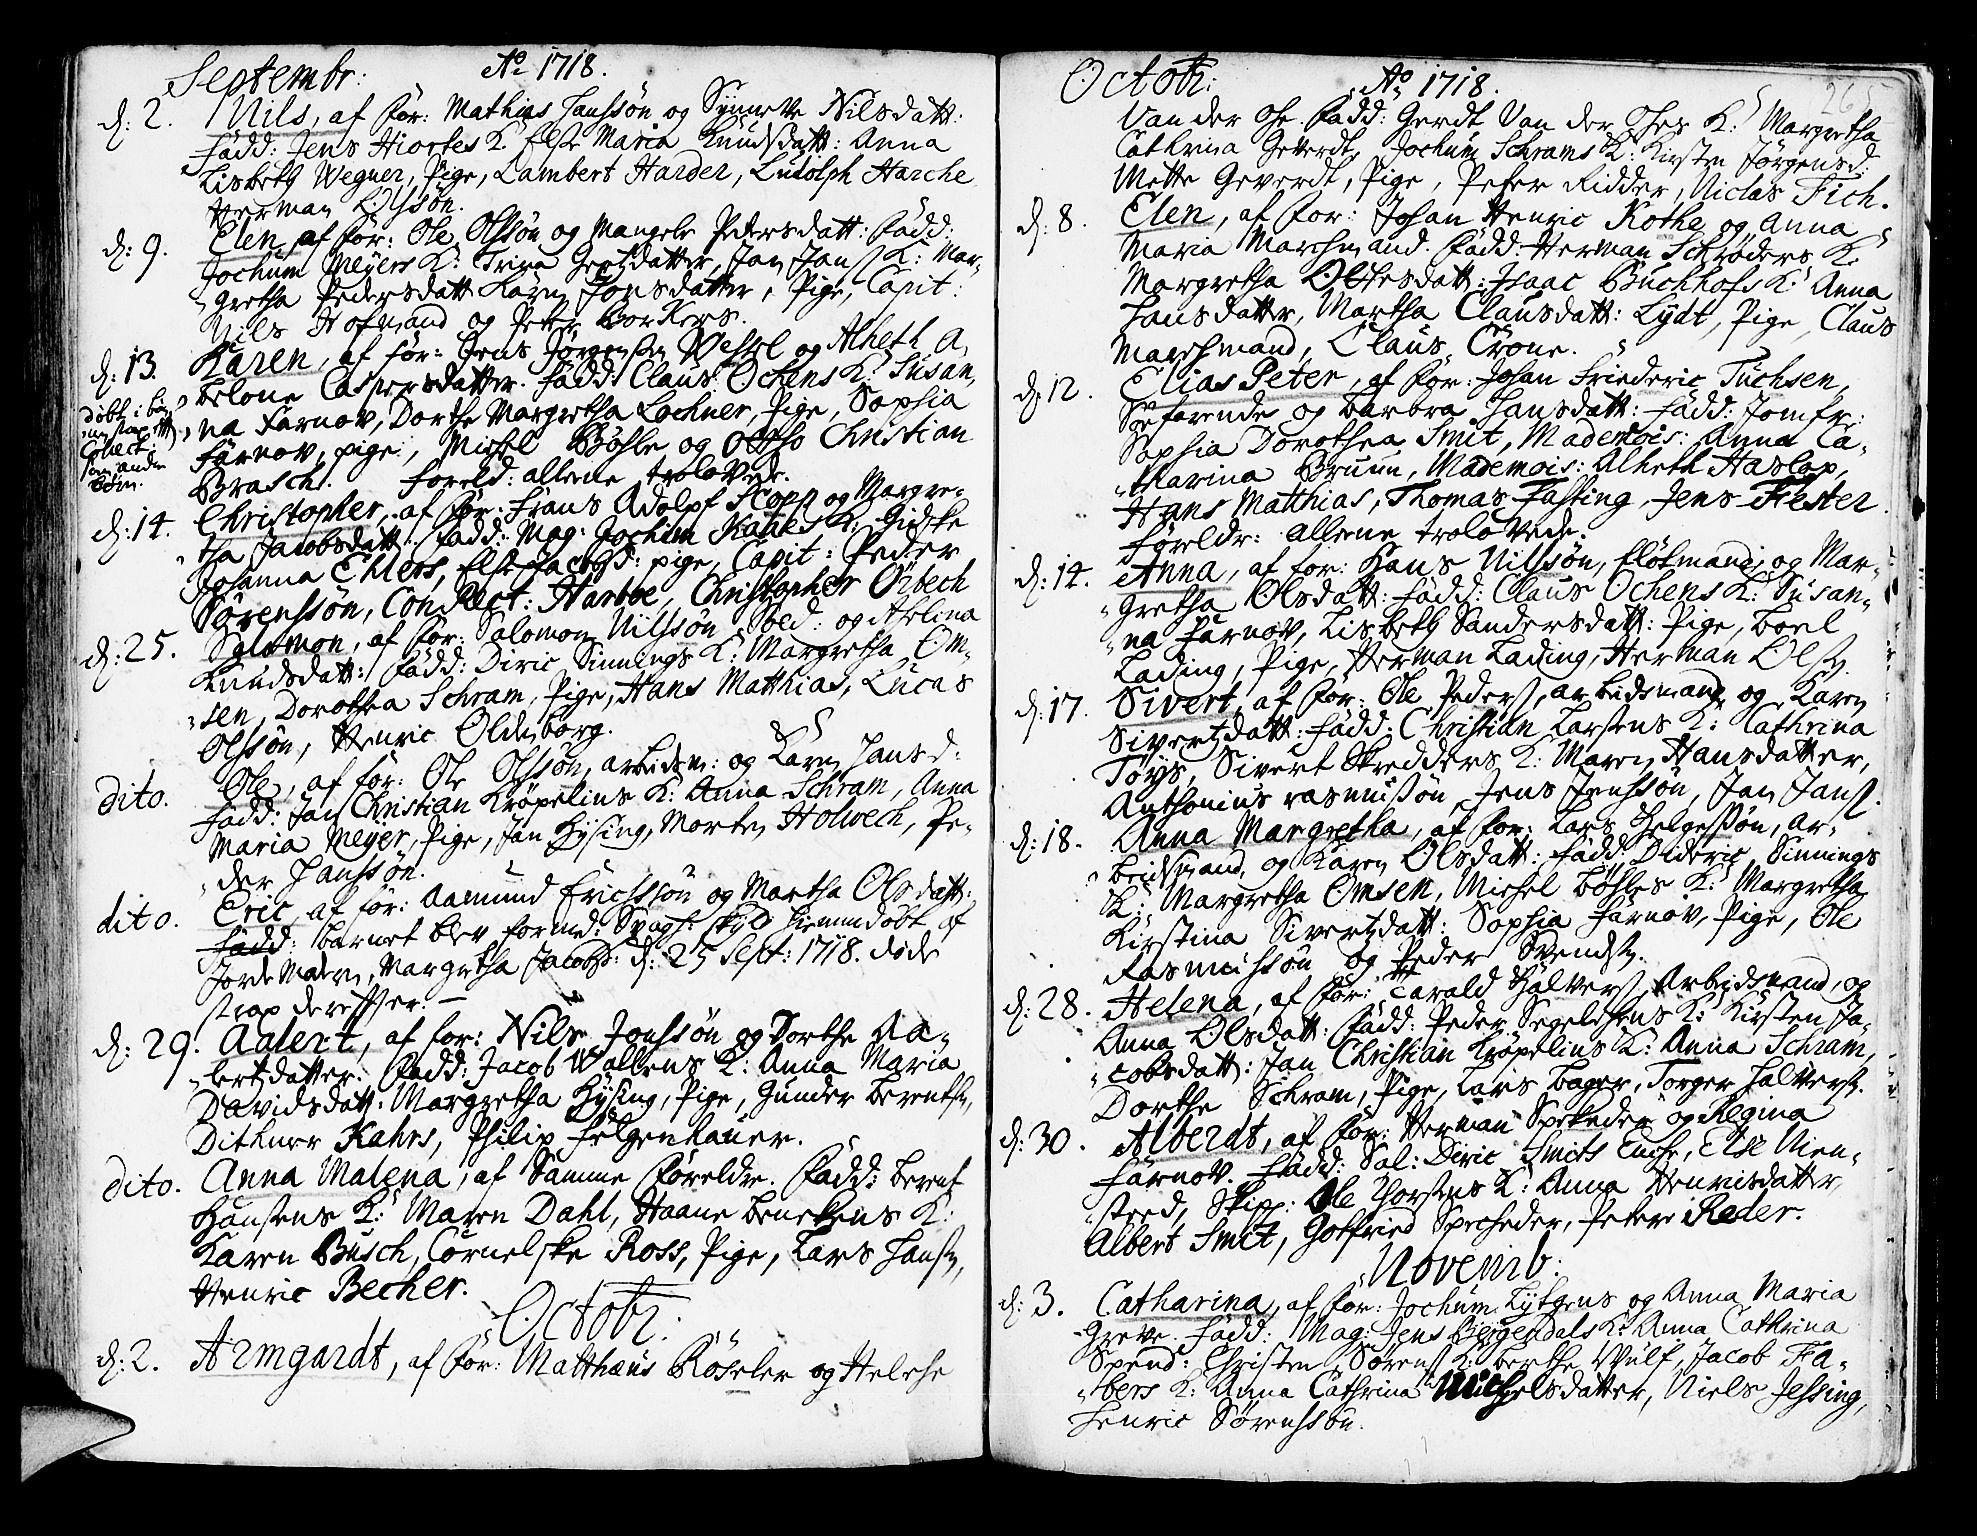 SAB, Korskirken Sokneprestembete, H/Haa/L0003: Ministerialbok nr. A 3, 1698-1719, s. 265